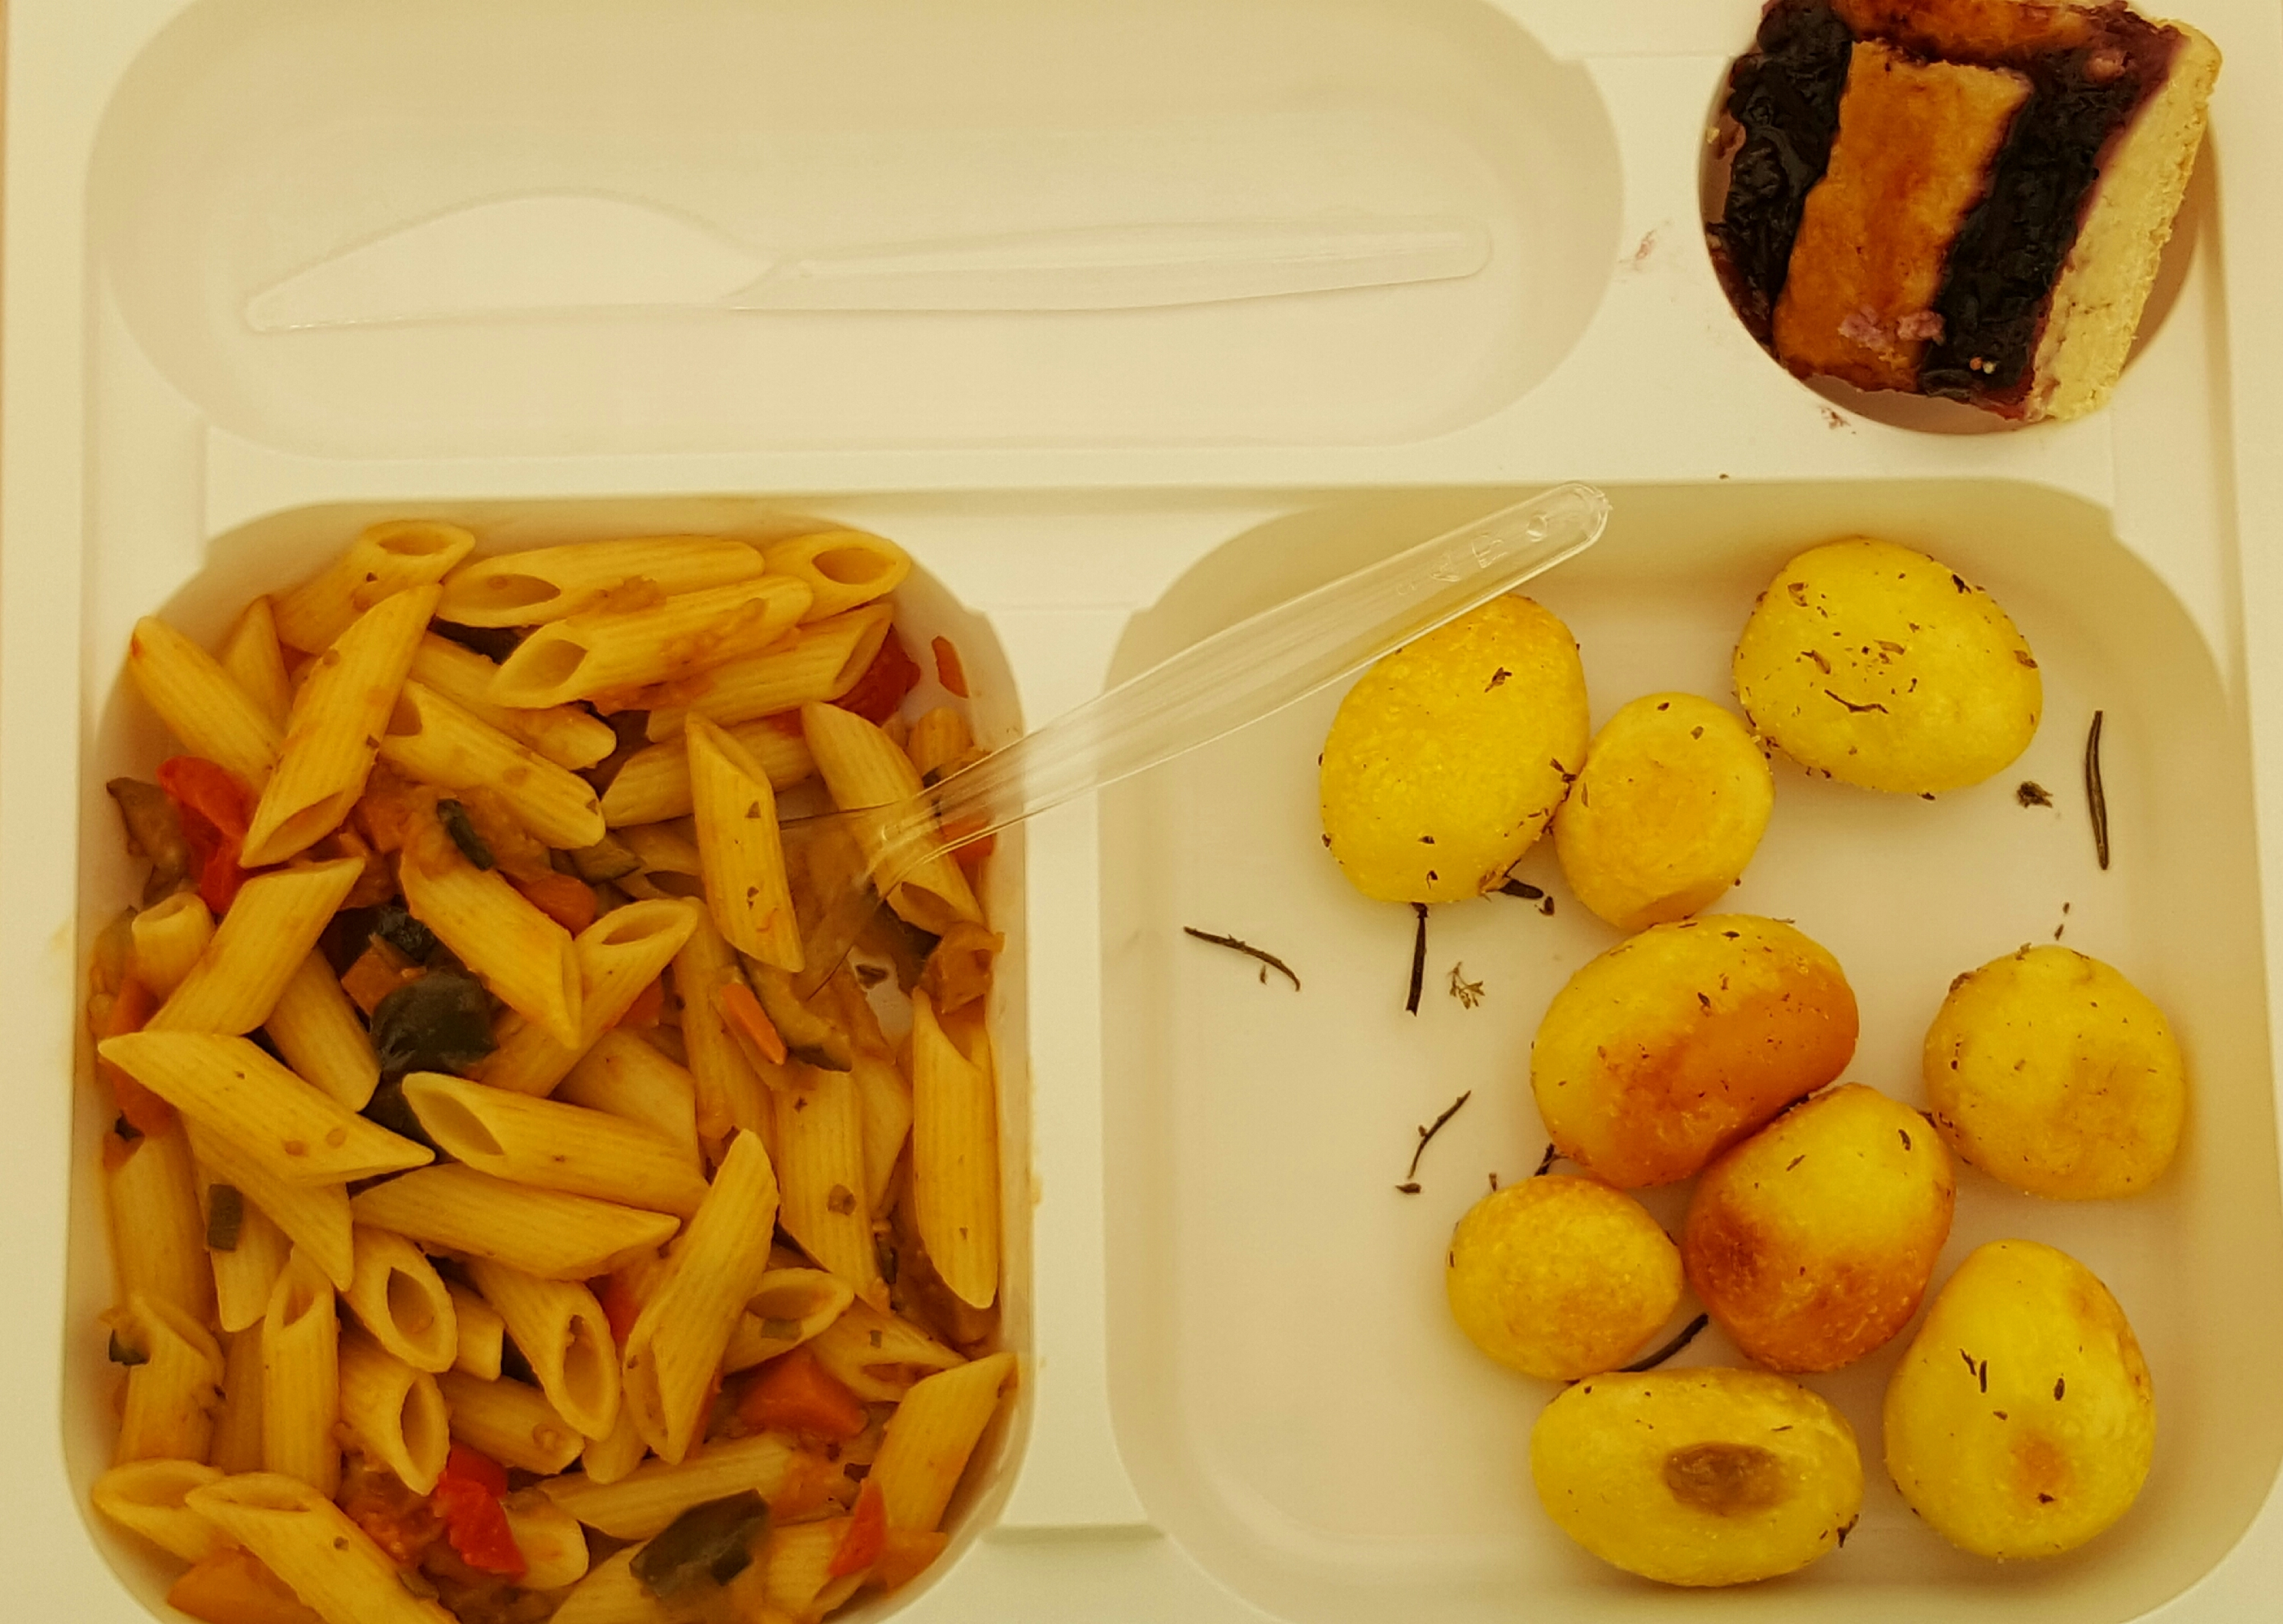 Licony pranzo